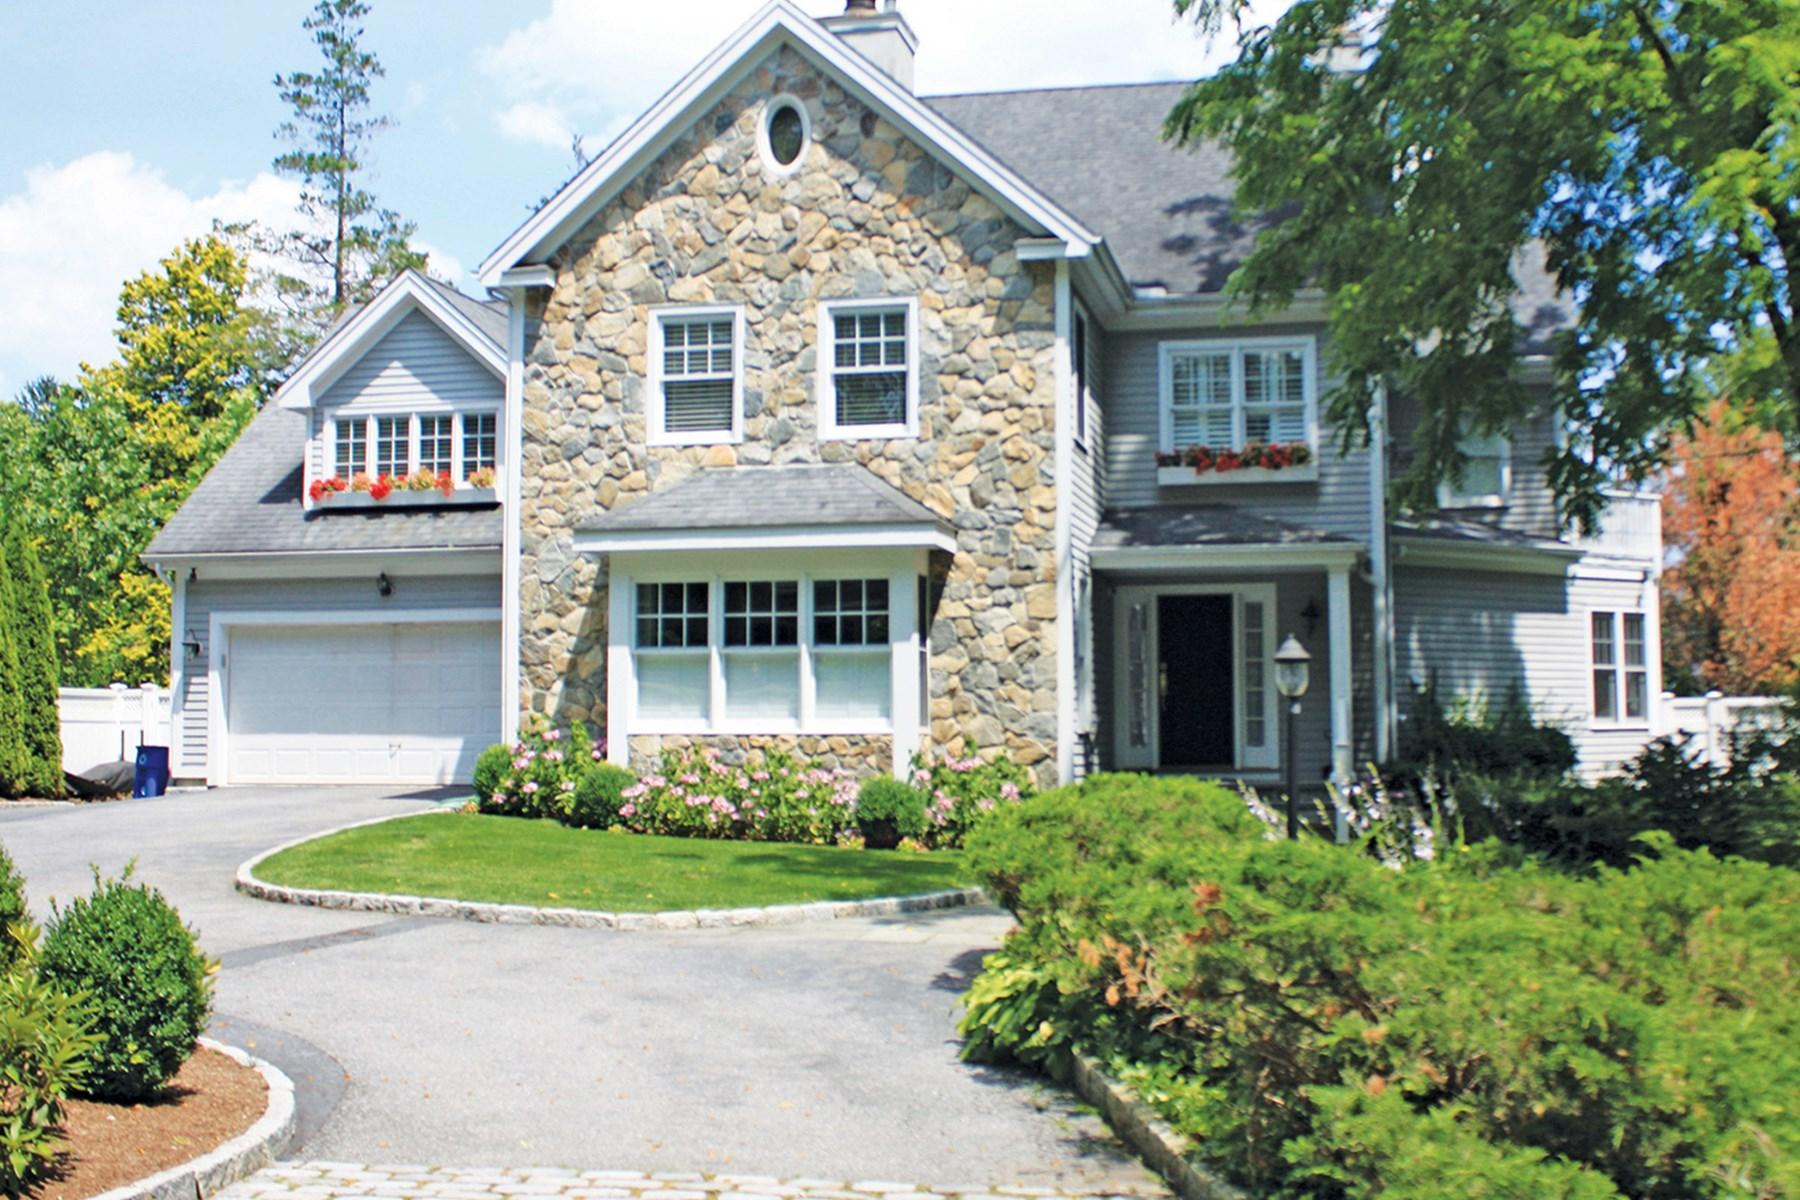 Casa para uma família para Venda às Water Views in Beloved Riverside 23 Willowmere Avenue Riverside, Connecticut 06878 Estados Unidos